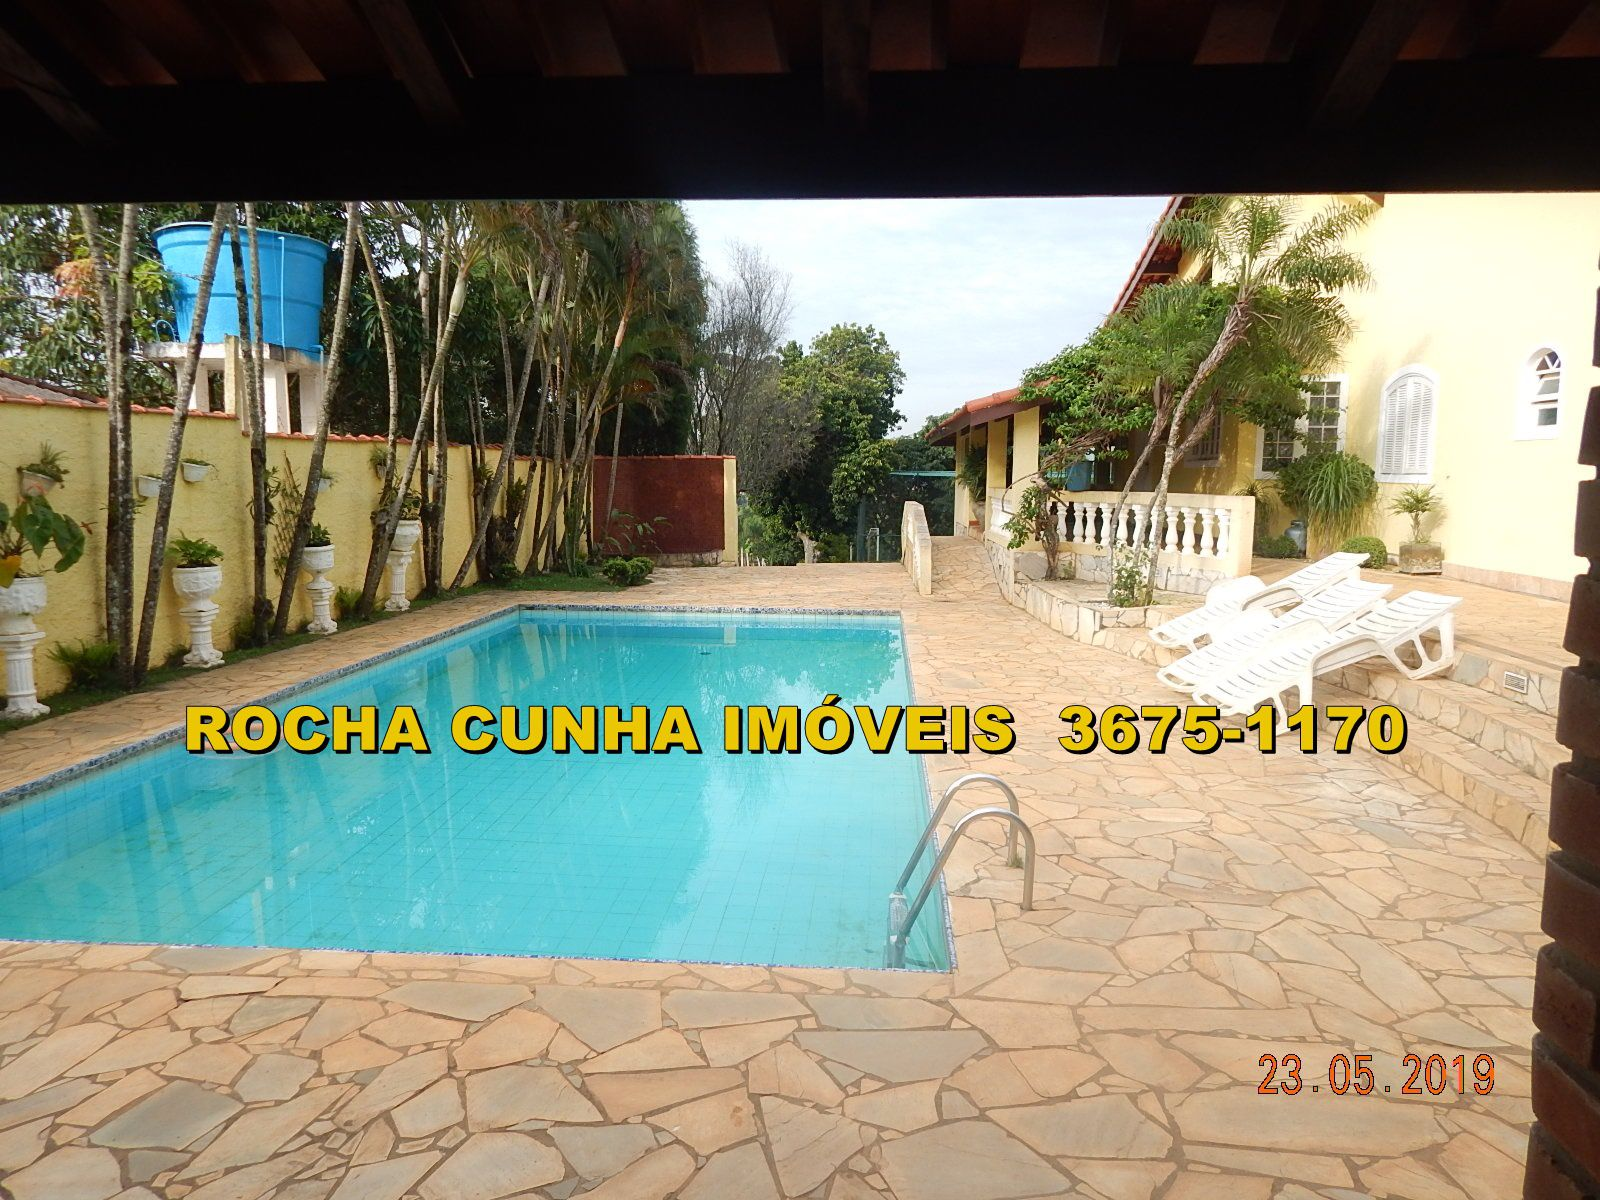 Chácara à venda Santana de Parnaíba,SP - R$ 780.000 - CHACARA0010 - 10